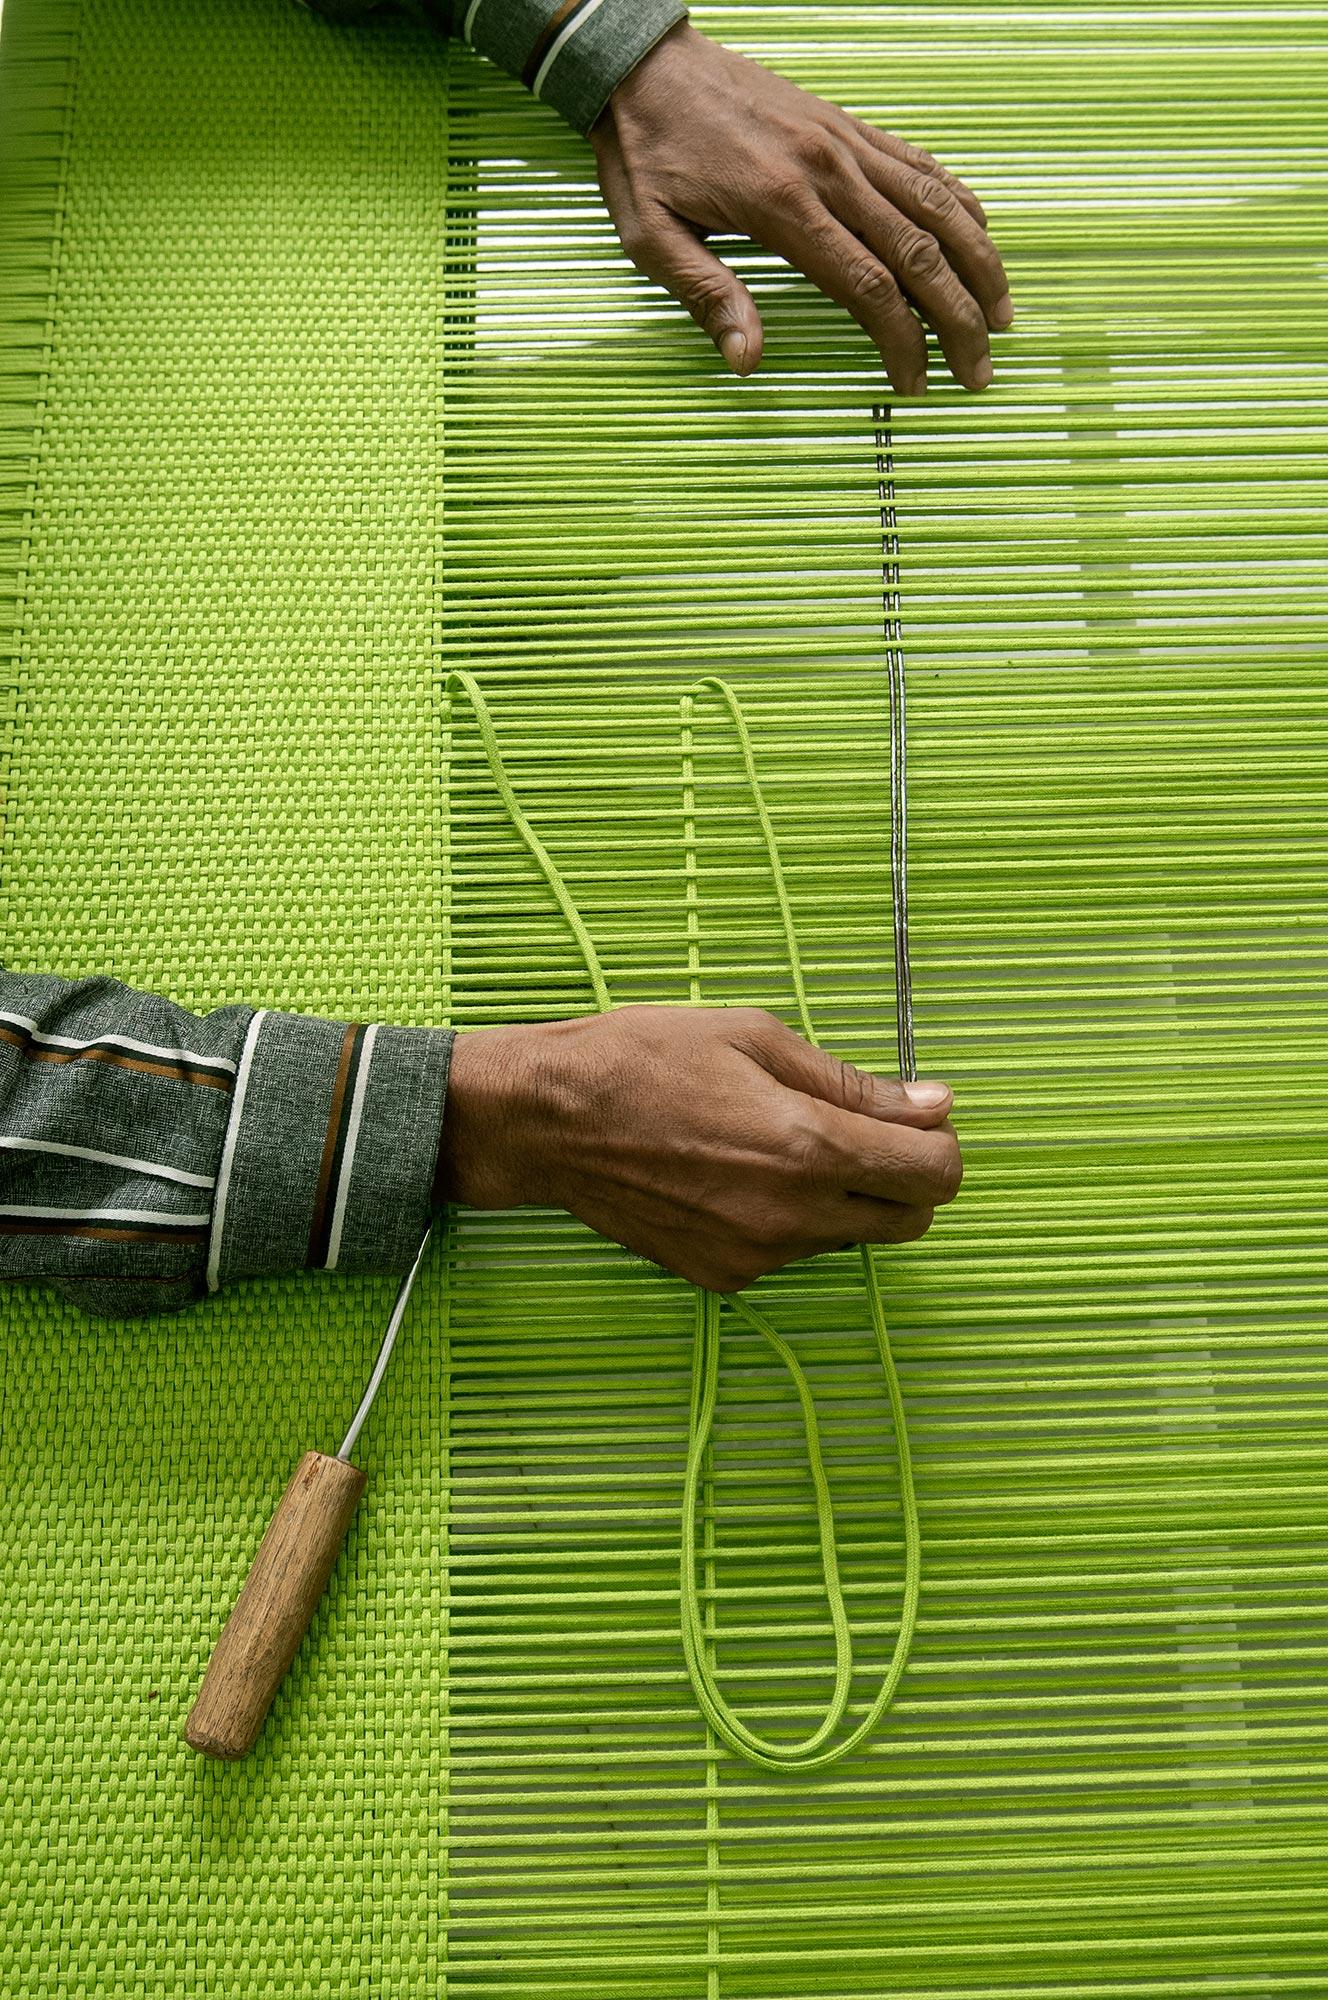 no-mad-india-making-of-green-charpoy